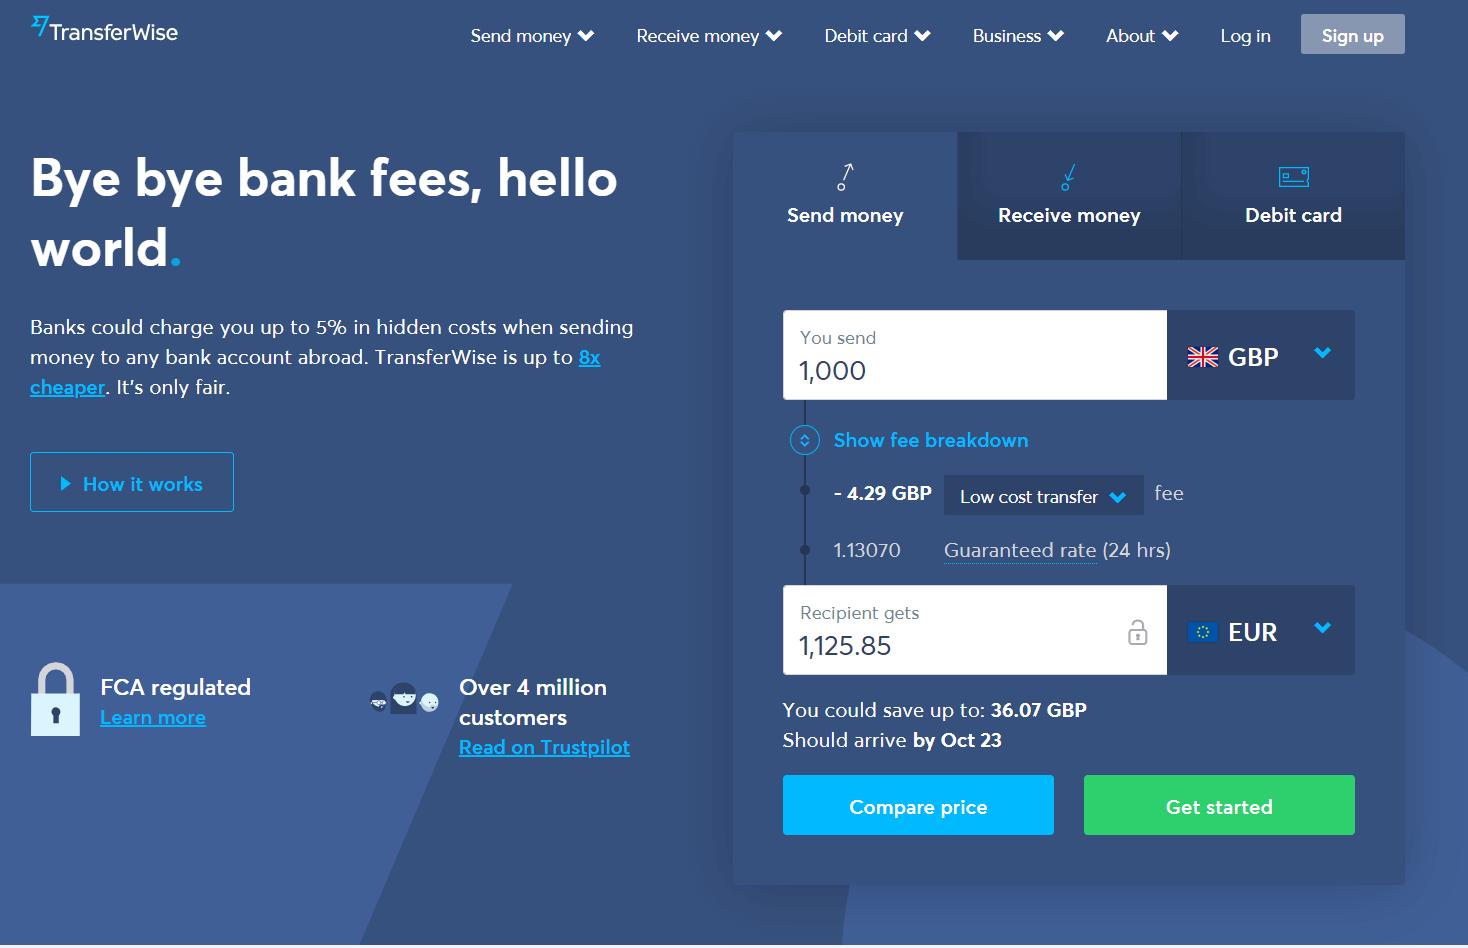 Digital-Banks-TransferWise-Homepage